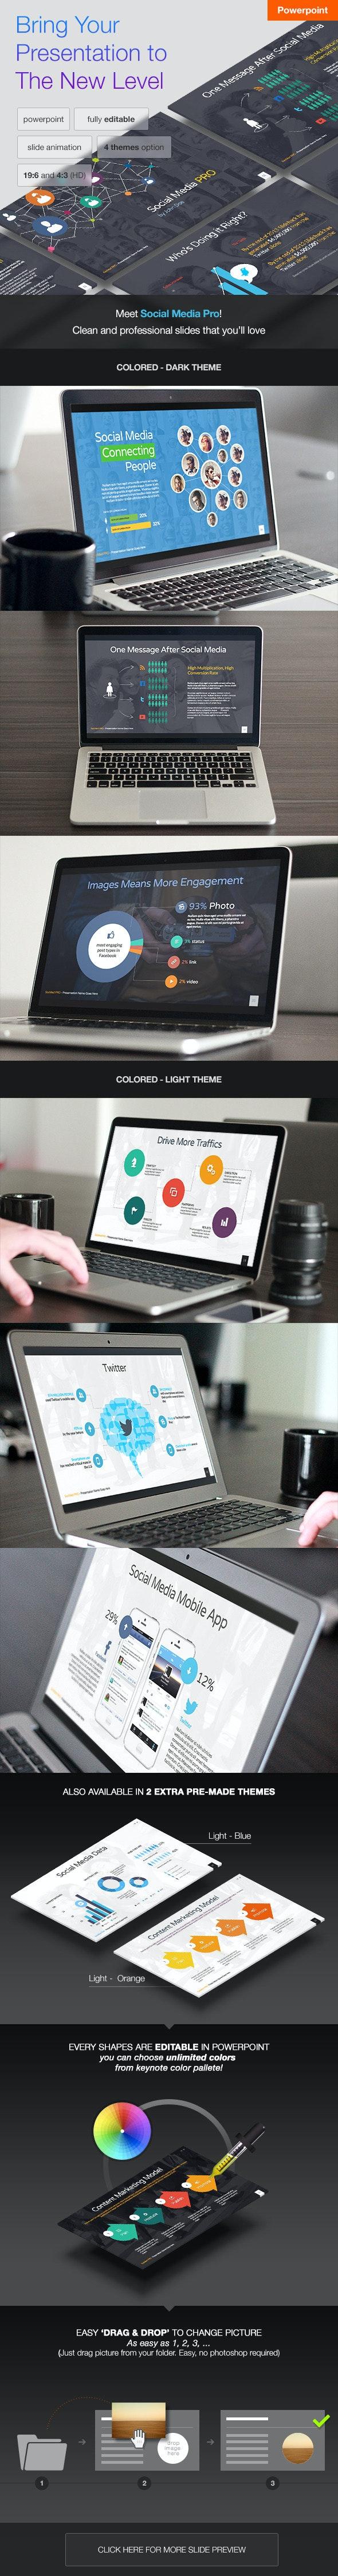 Social Media PRO - Powerpoint Template - PowerPoint Templates Presentation Templates